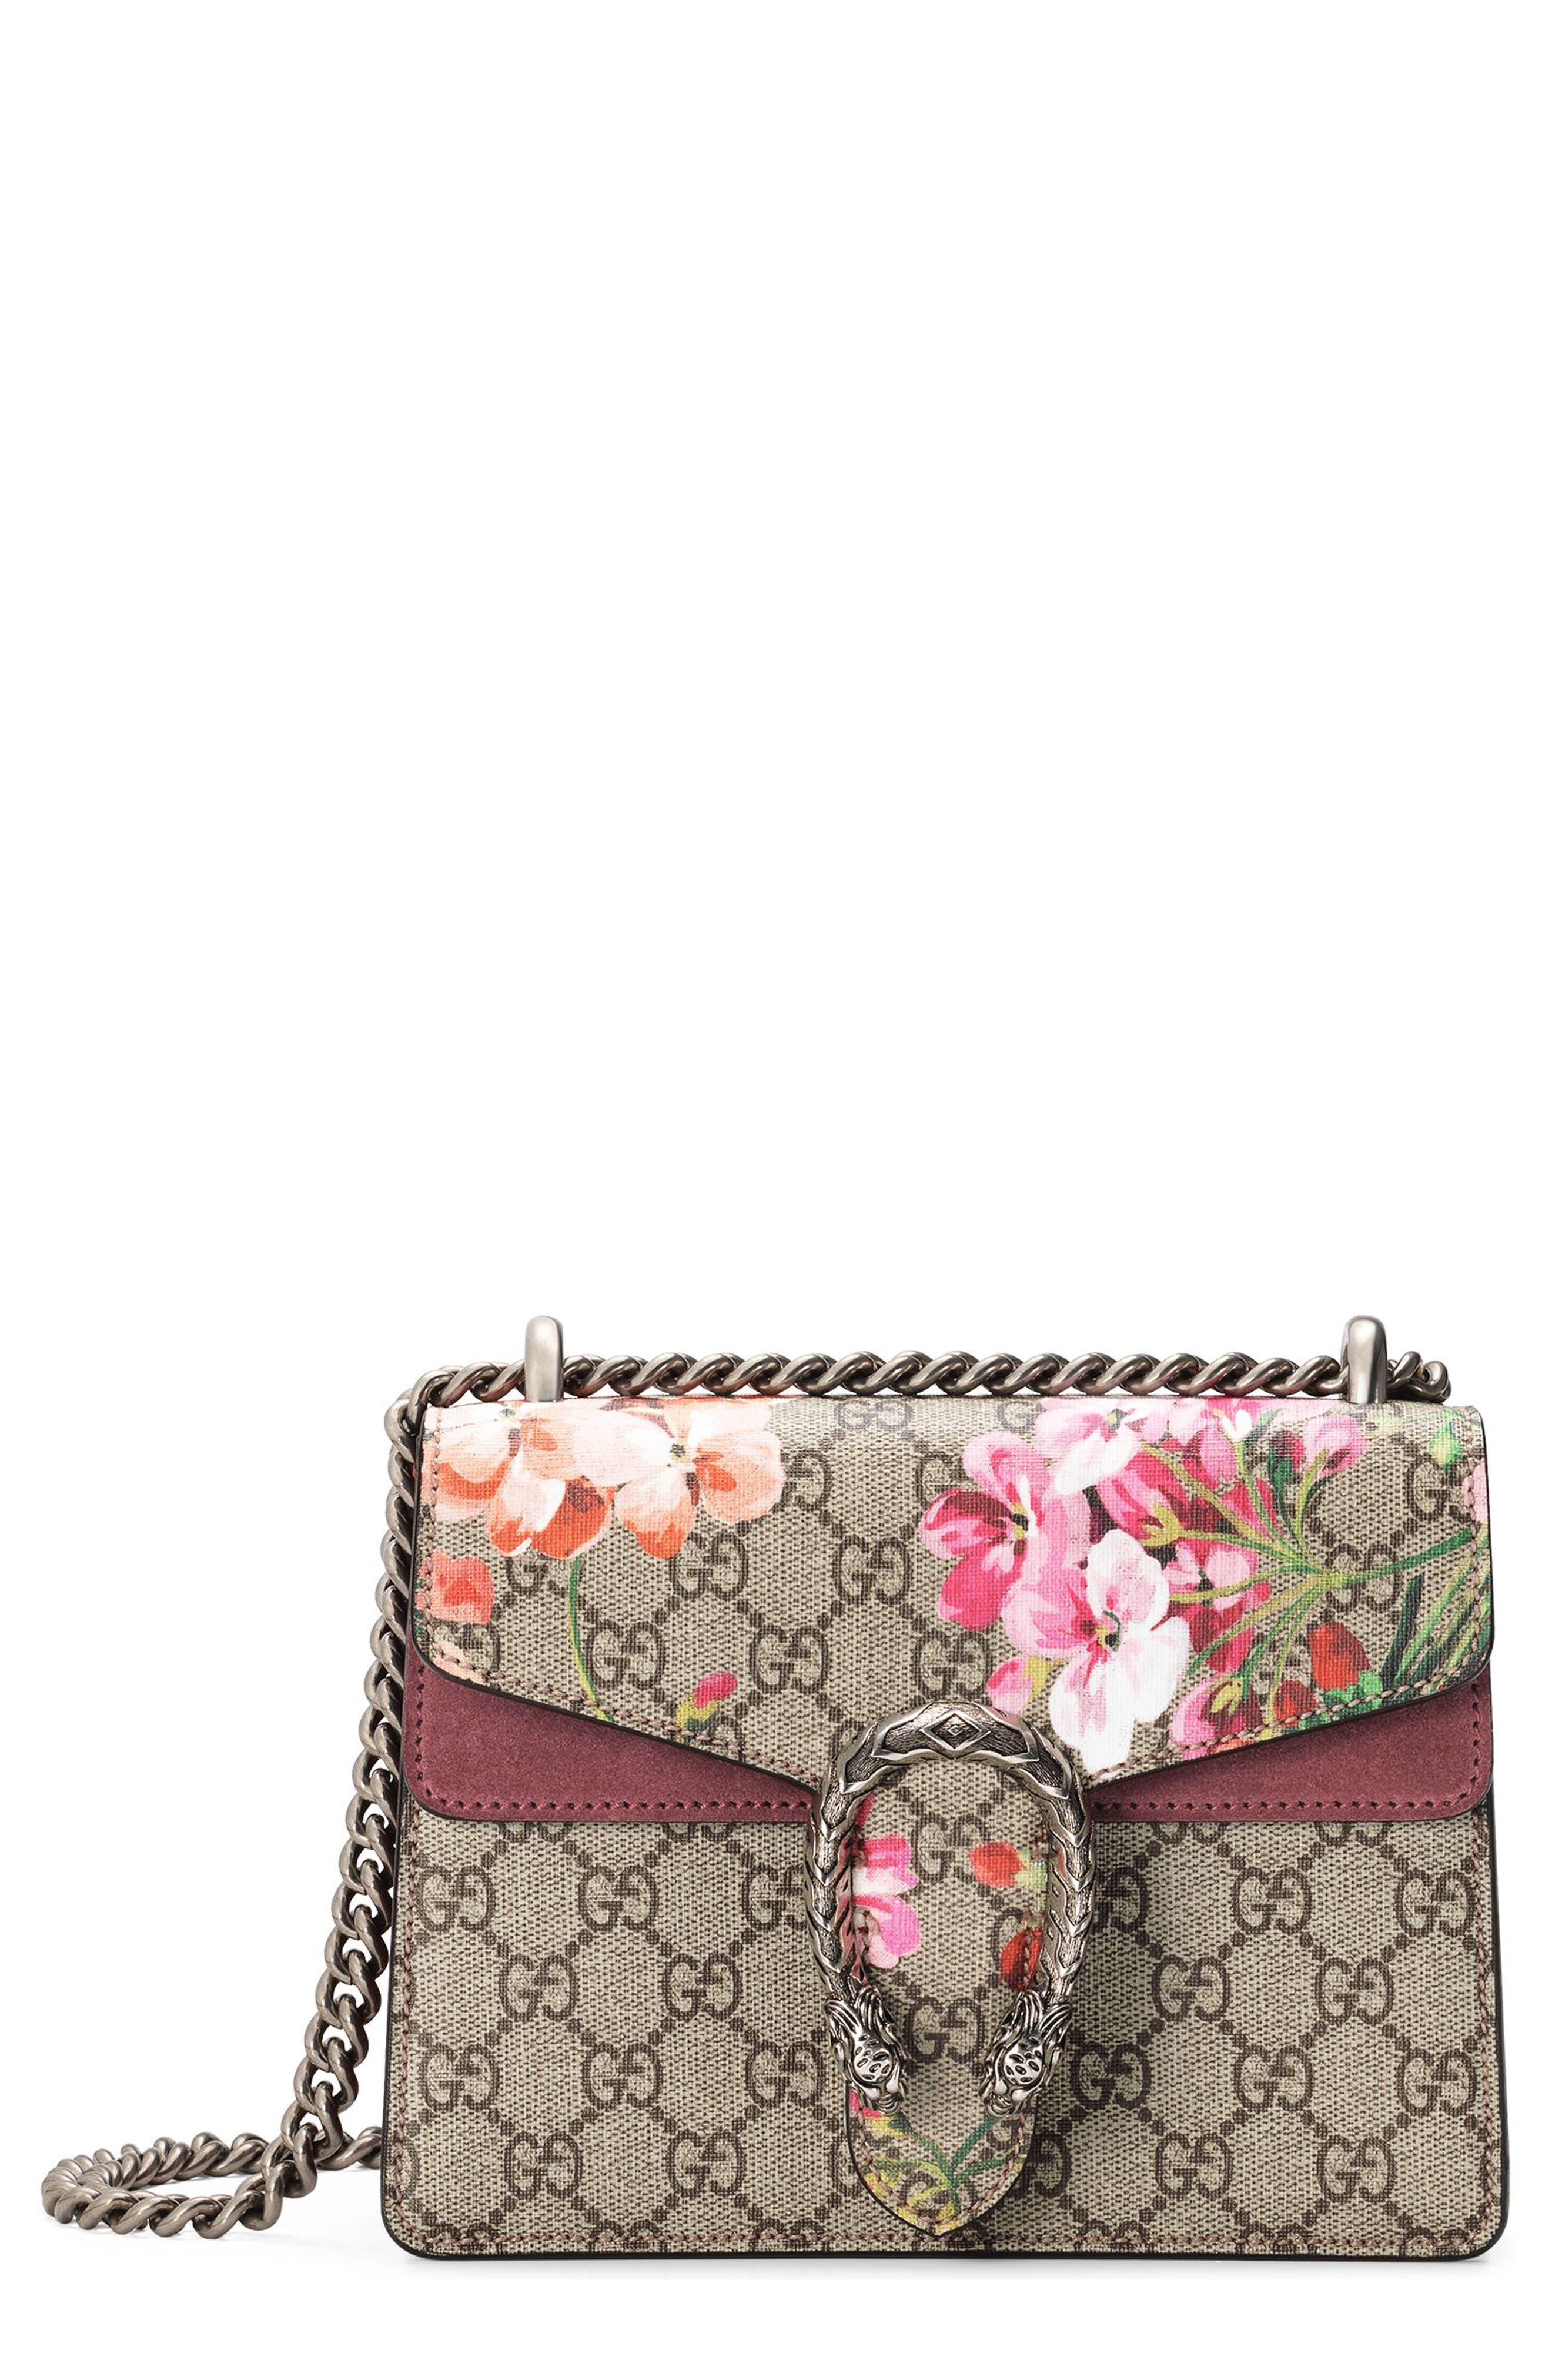 GUCCI Mini Dionysus GG Blooms Canvas & Suede Shoulder Bag